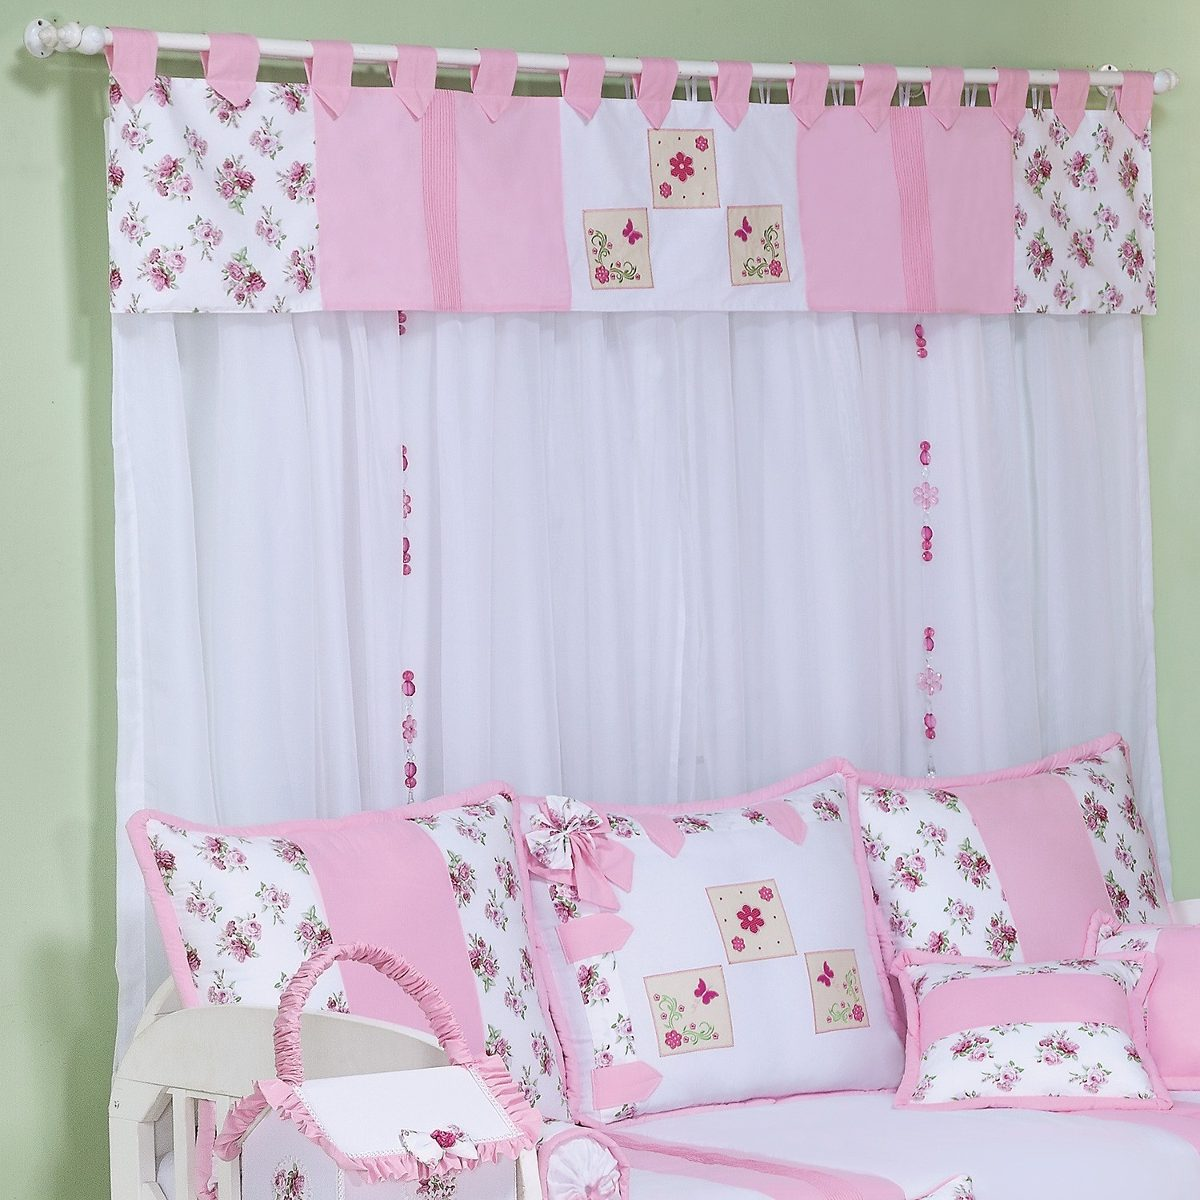 20170130222151 cortinas para quarto de bebe de urso - Cortinas para bebe ...